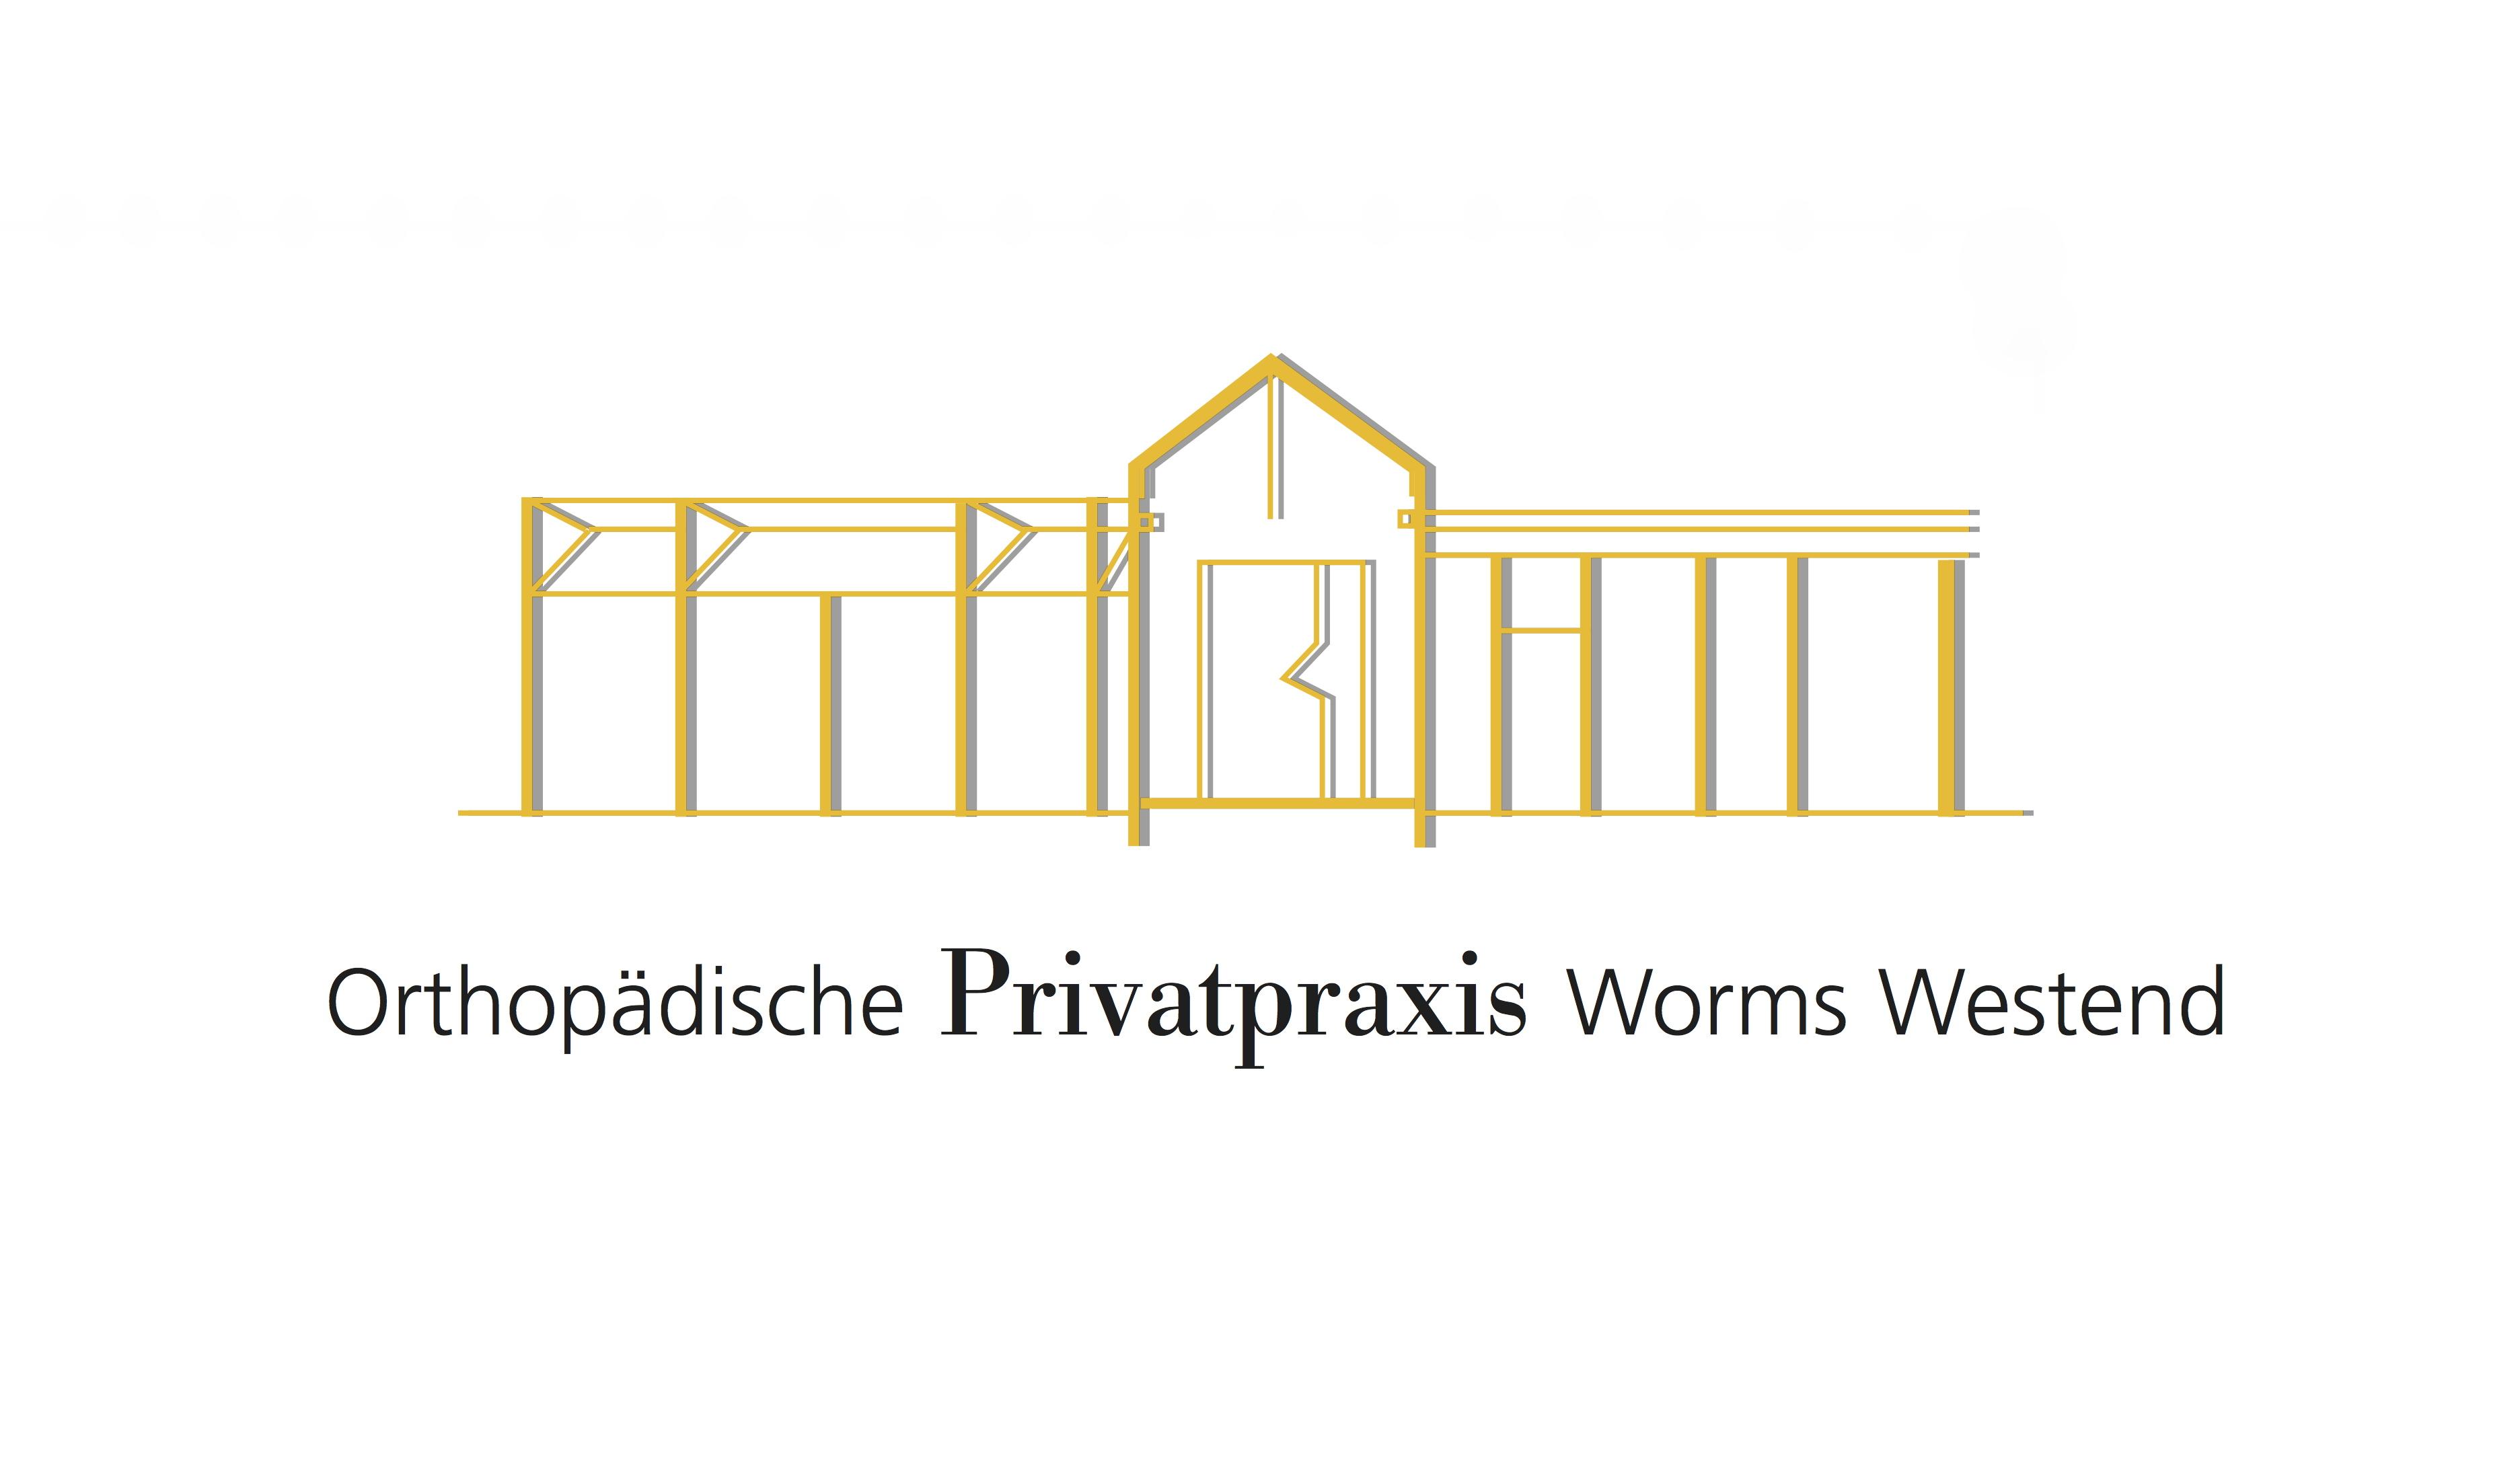 Dr. med J. Ebner & Kollegen, orthopädische Privatpraxis in Worms